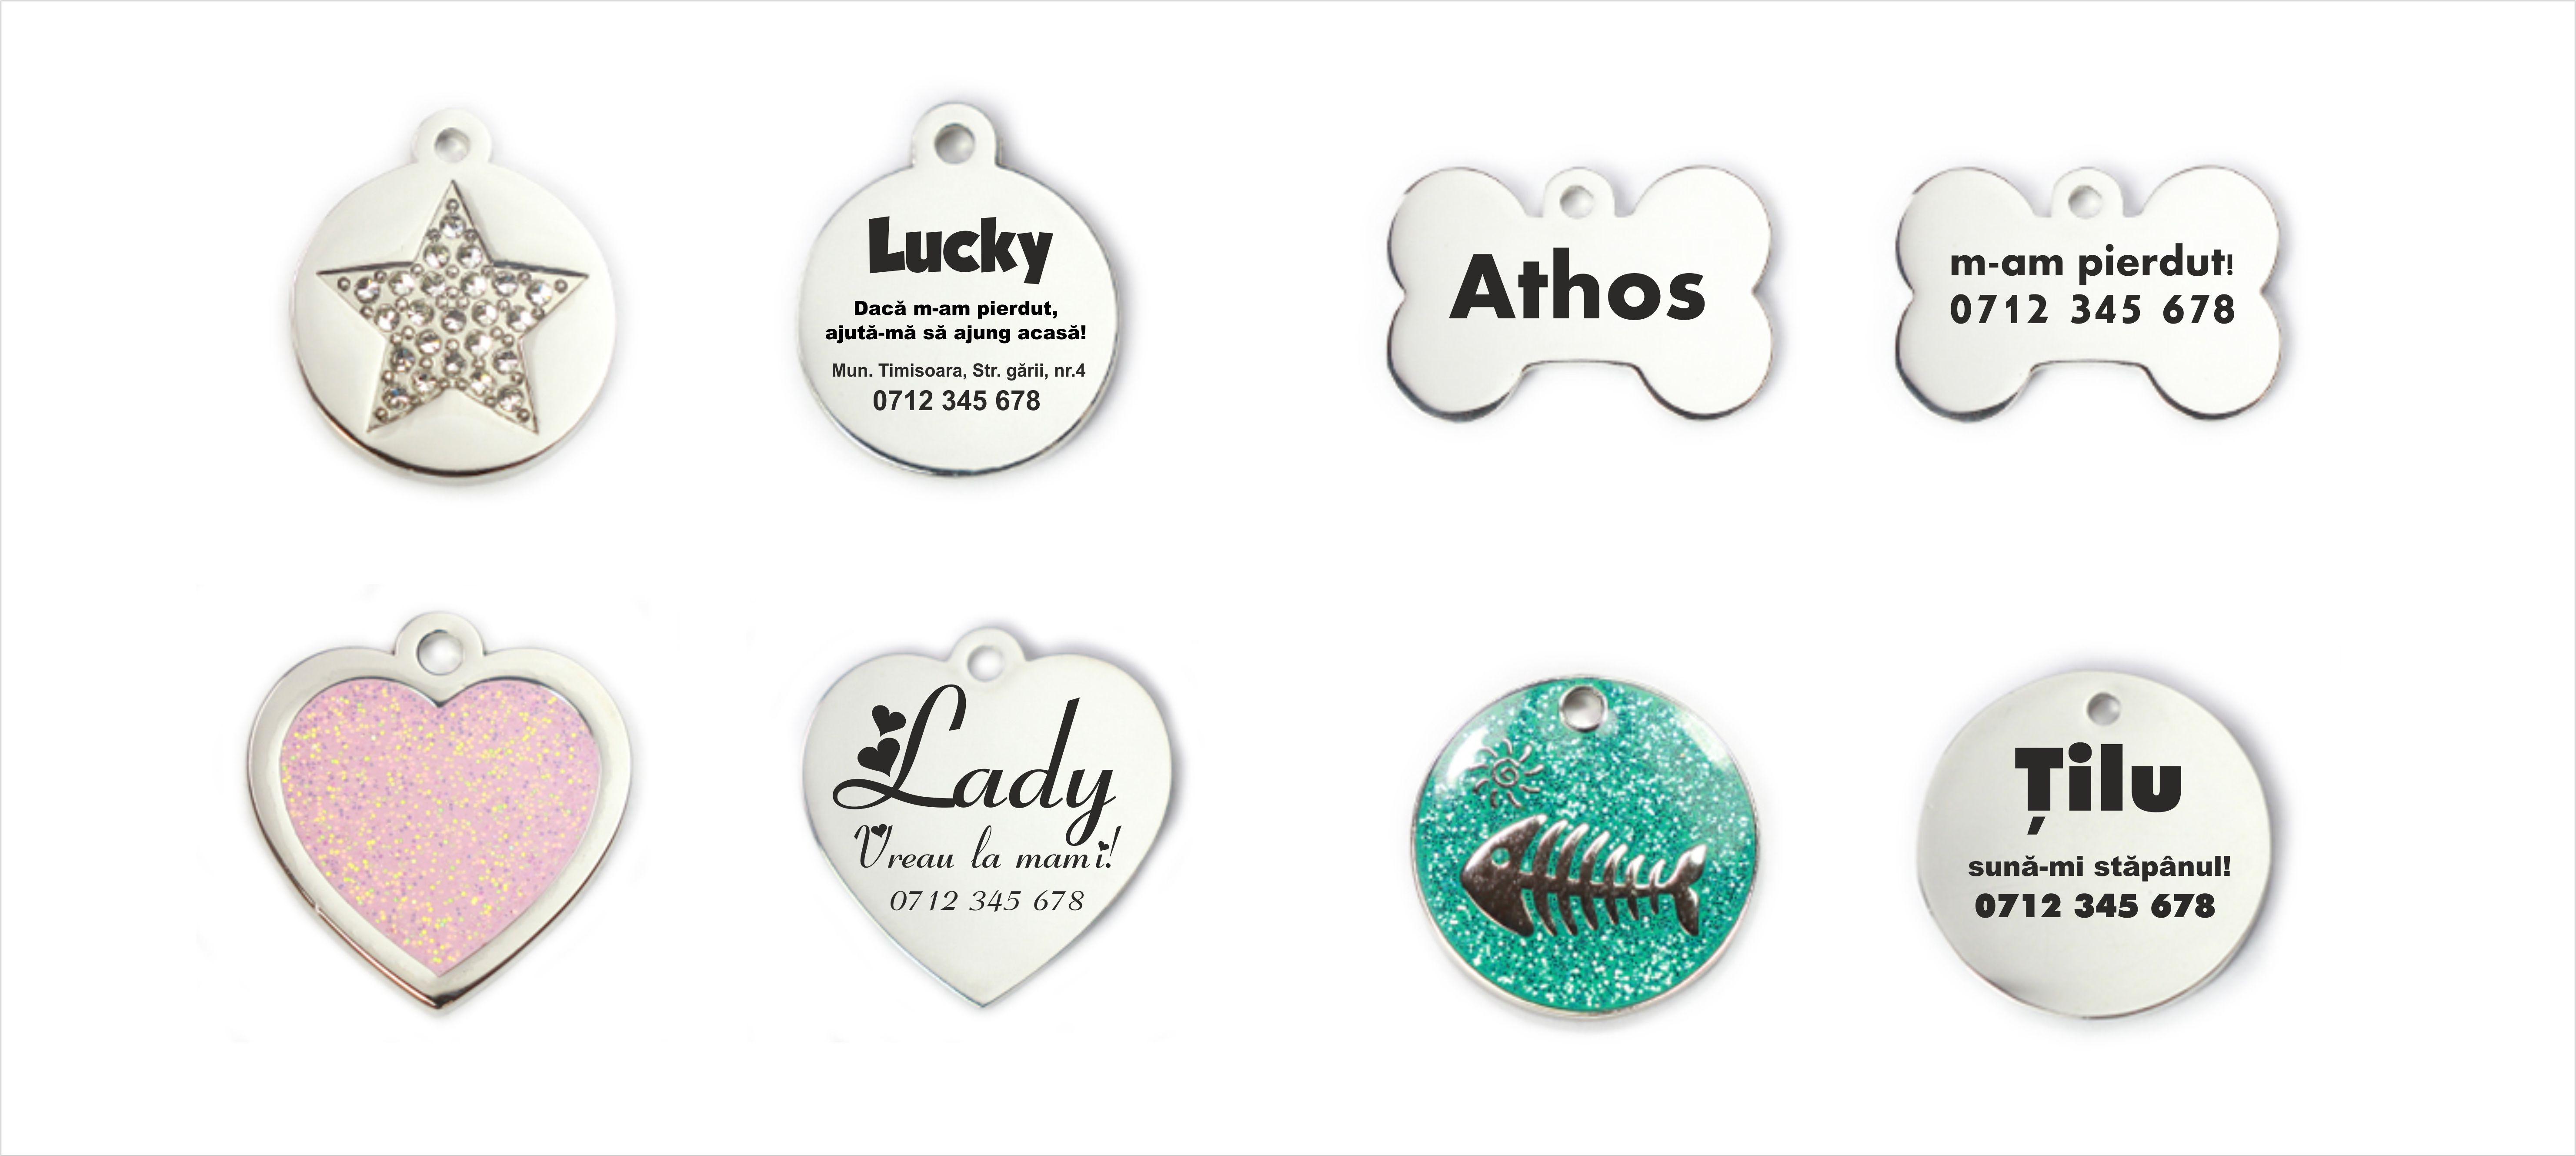 Lucky pet medalioane personalizate animale companie romania